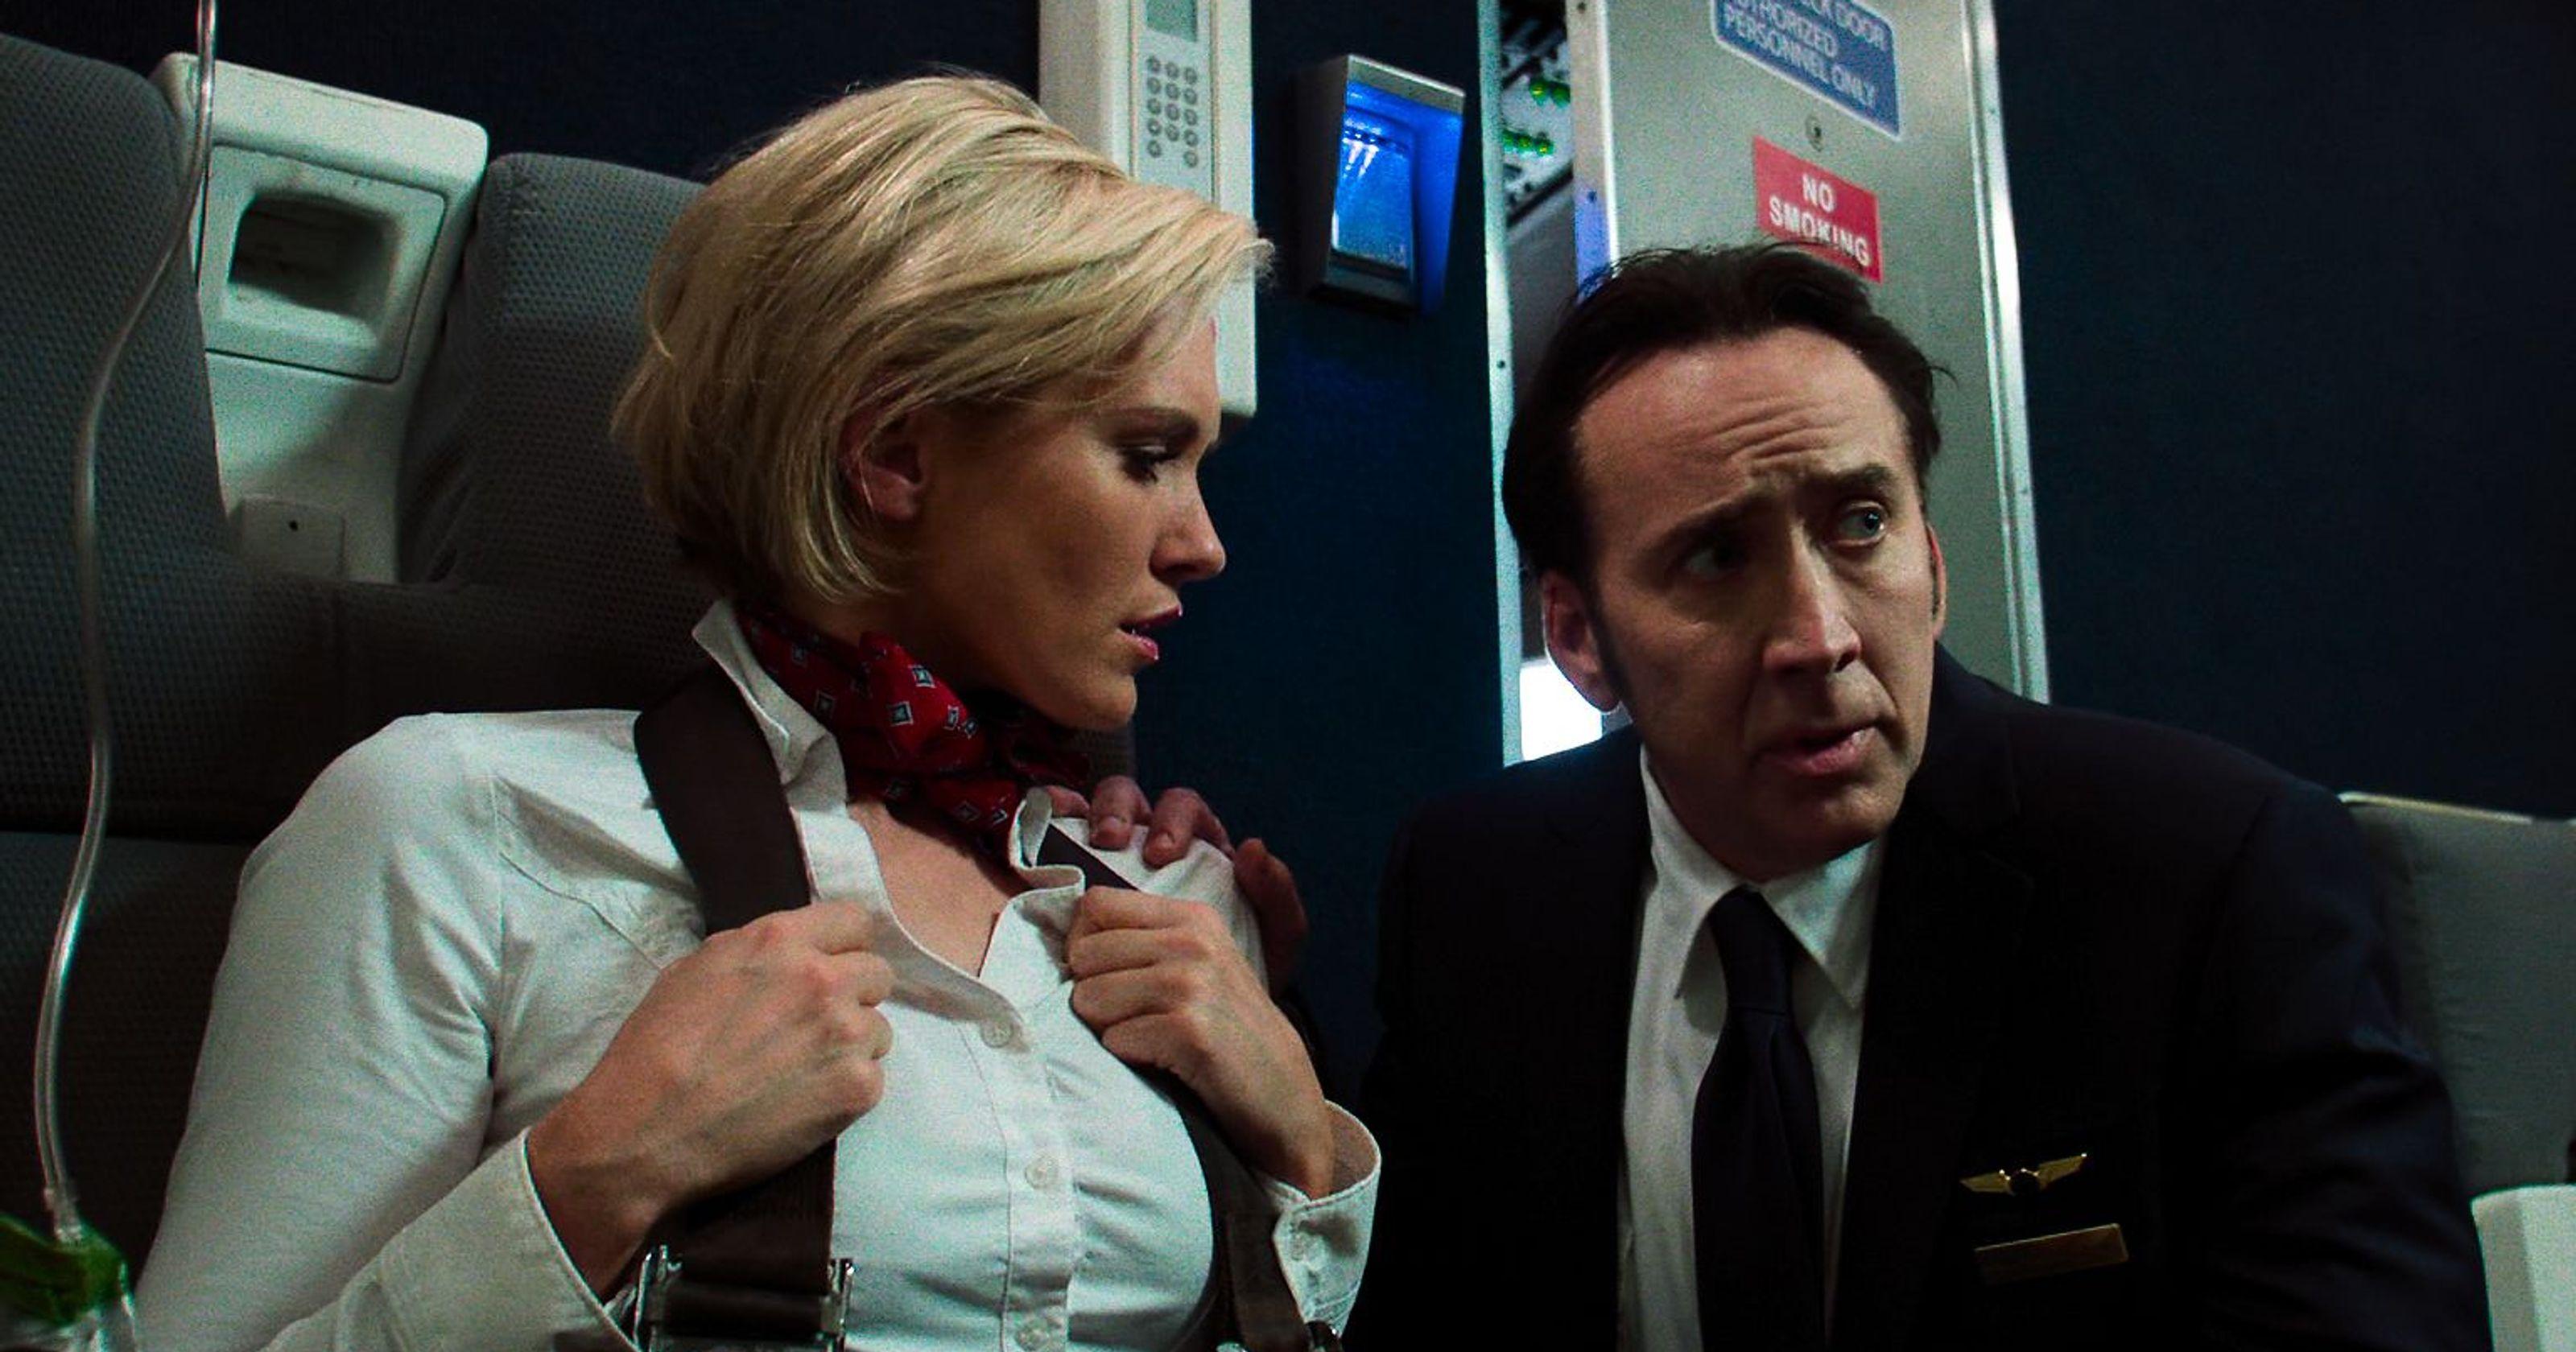 Nicolas Cage, Nicky Whelan in Left Behind (2014)